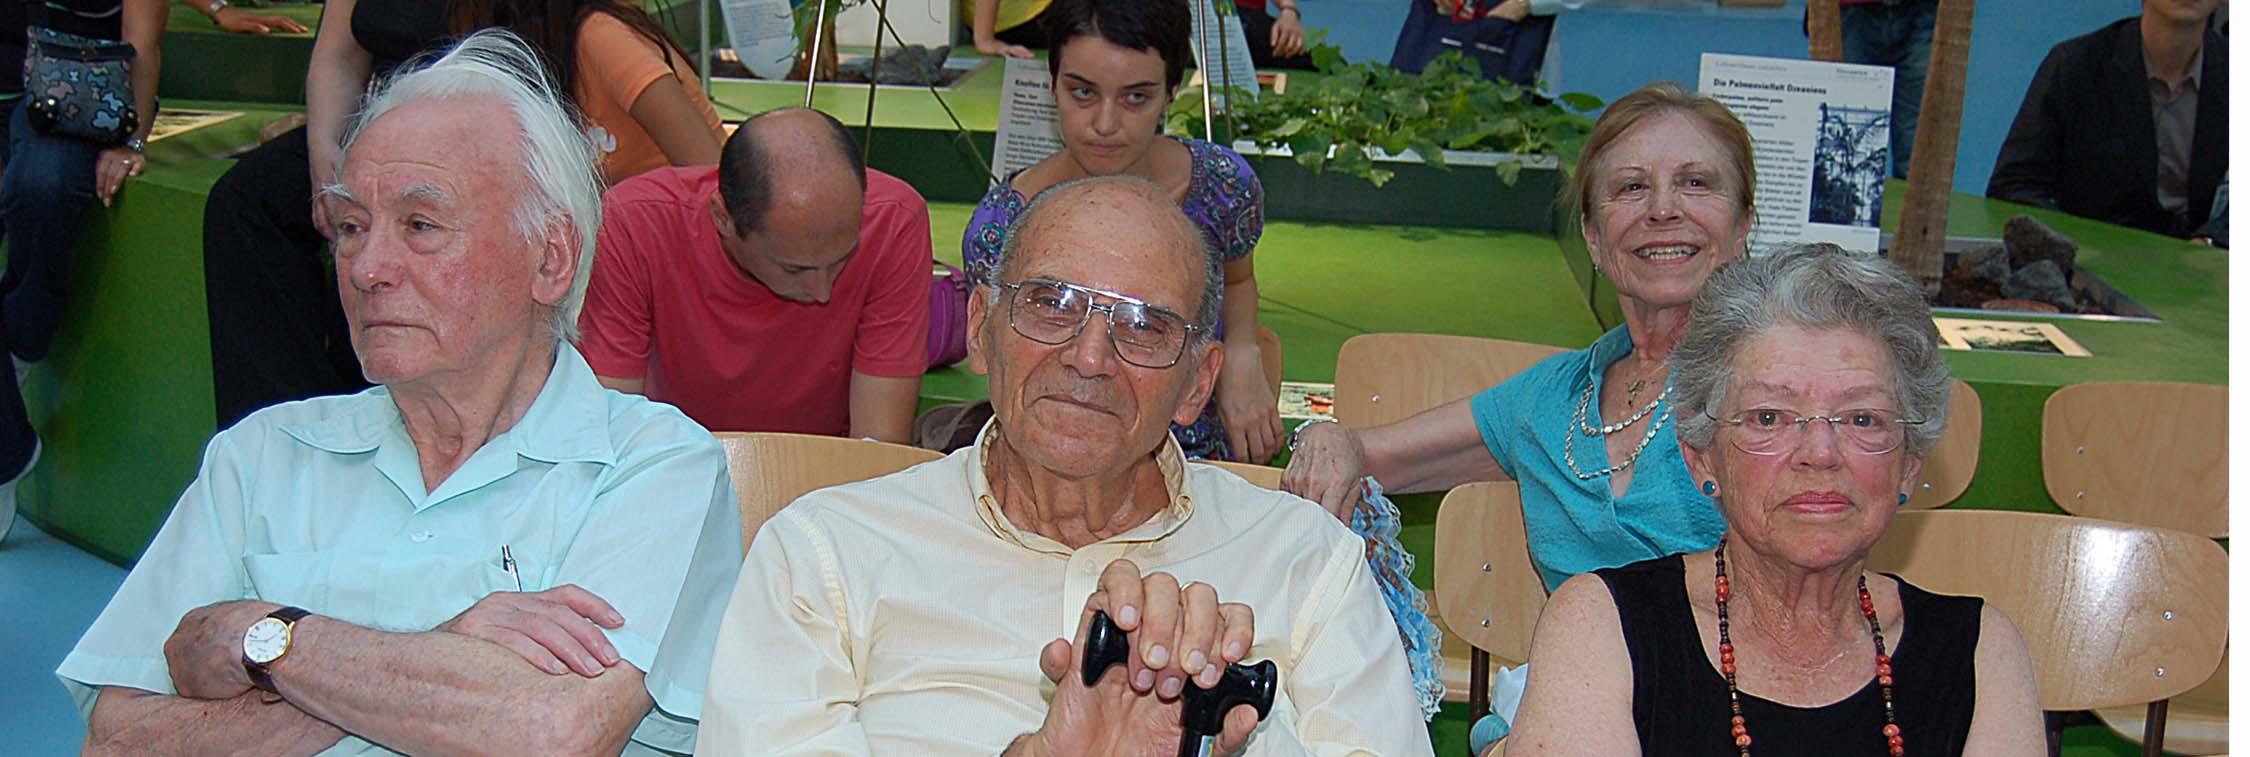 Harry Triandis (center) 1926-2019